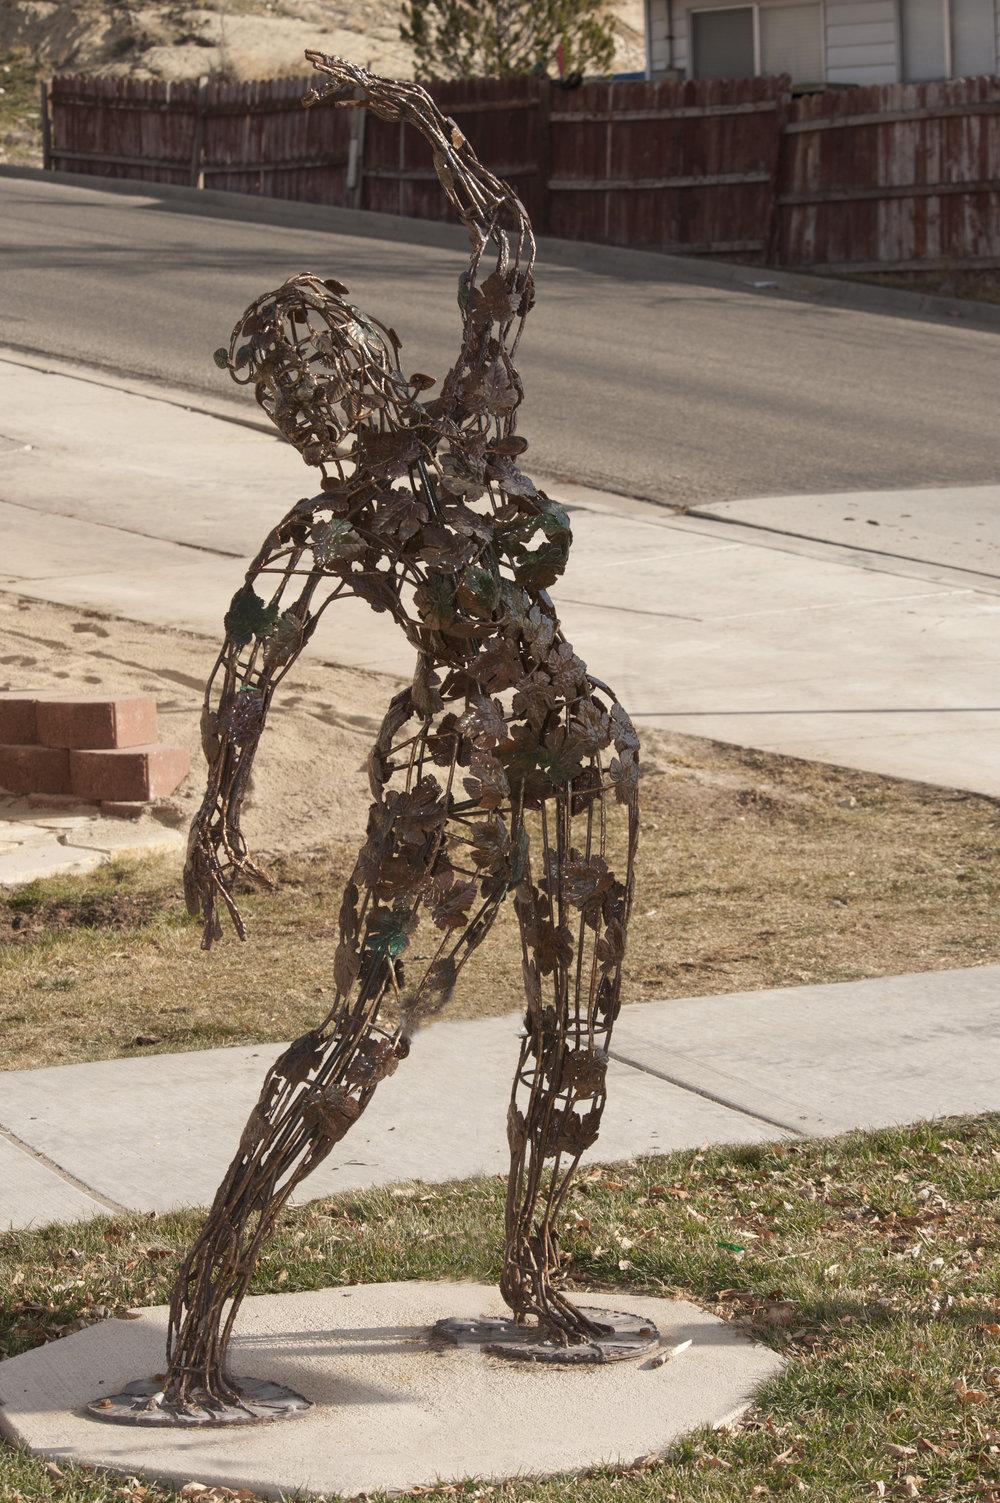 SAC_Sculpture_MetalWoman (2).jpg